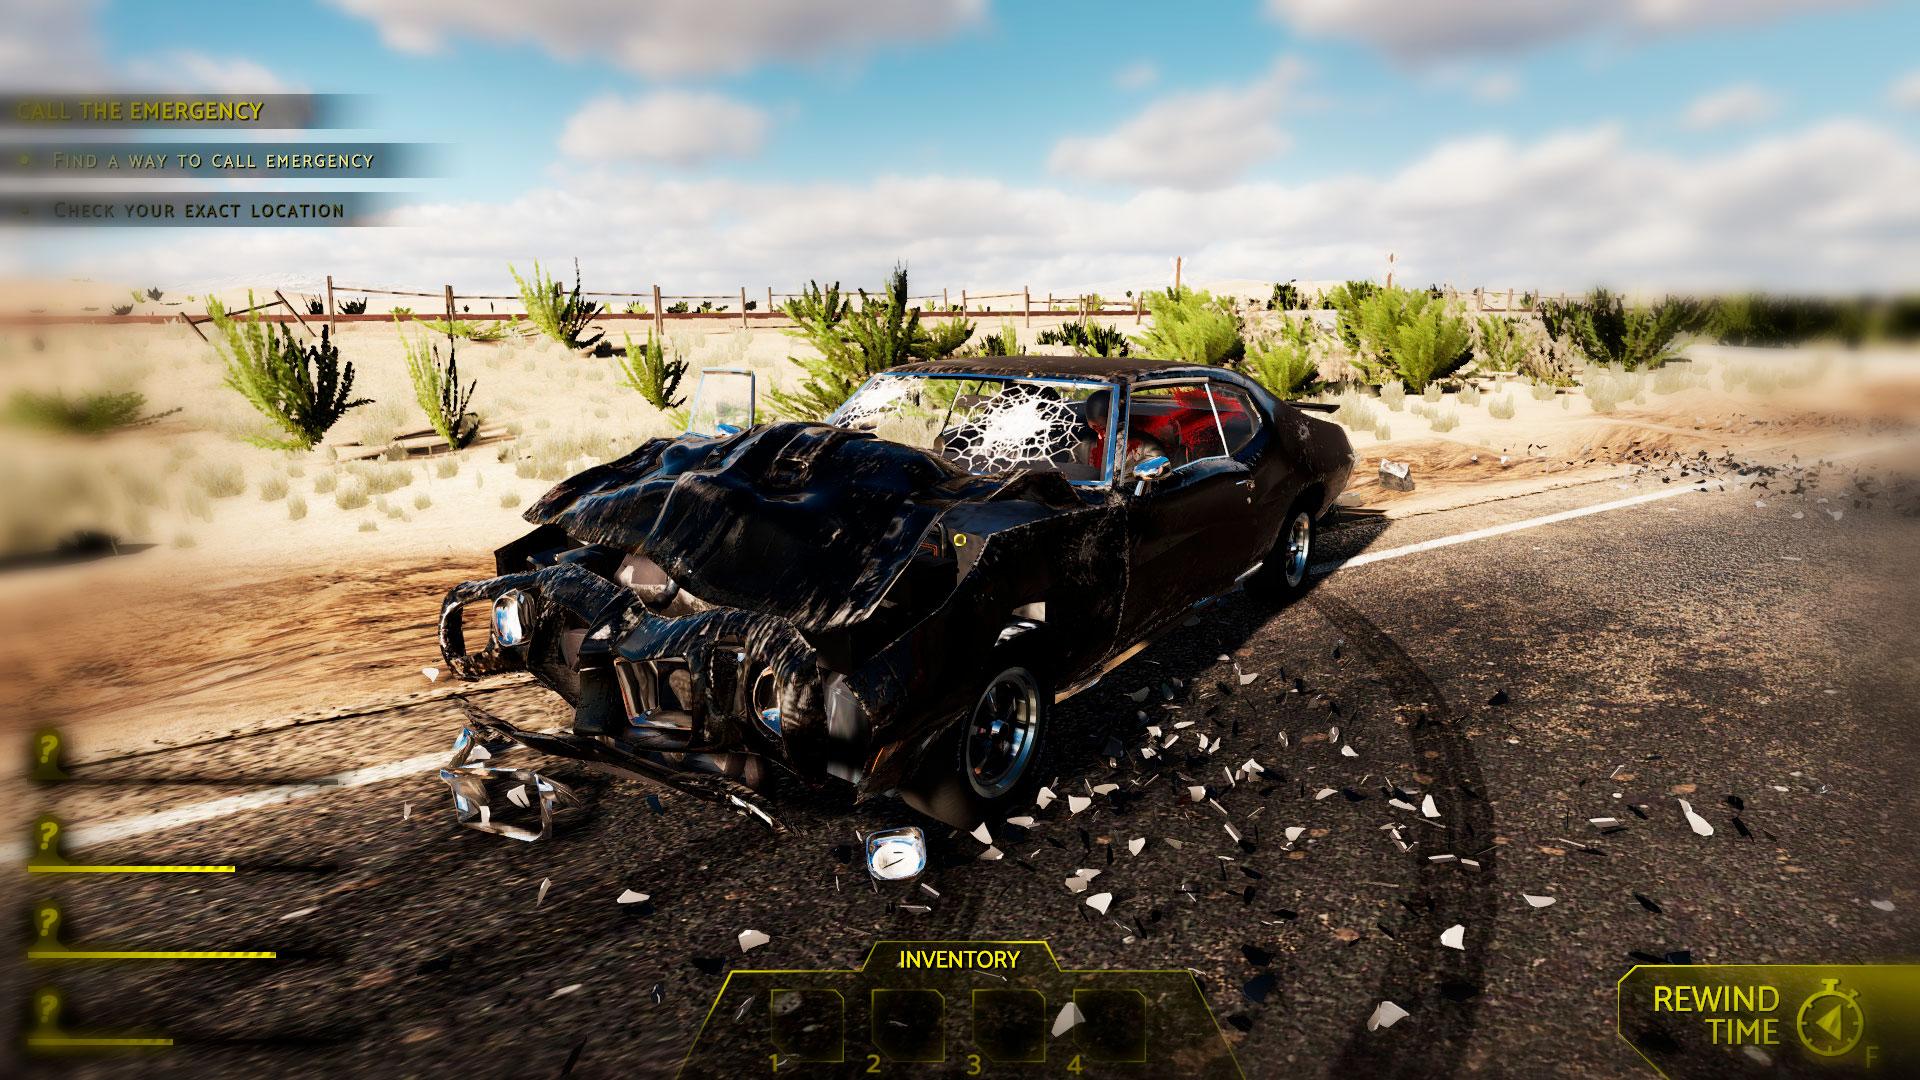 Accident и поиск улик